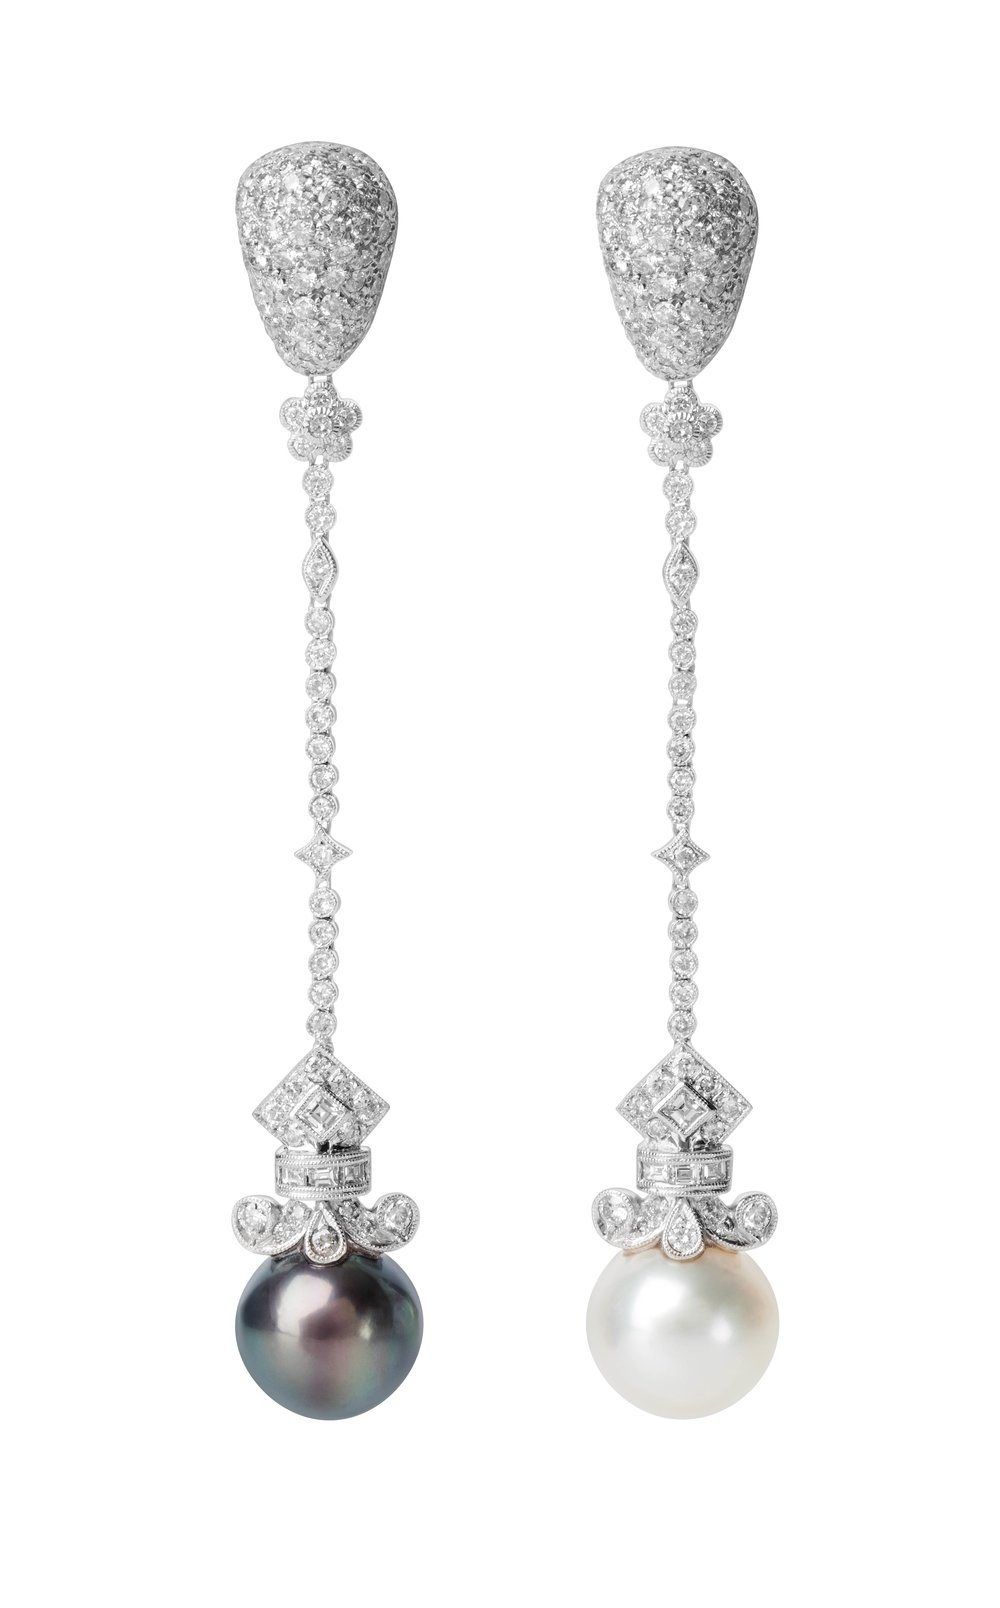 Royal de Versailles High Jewellery Collection